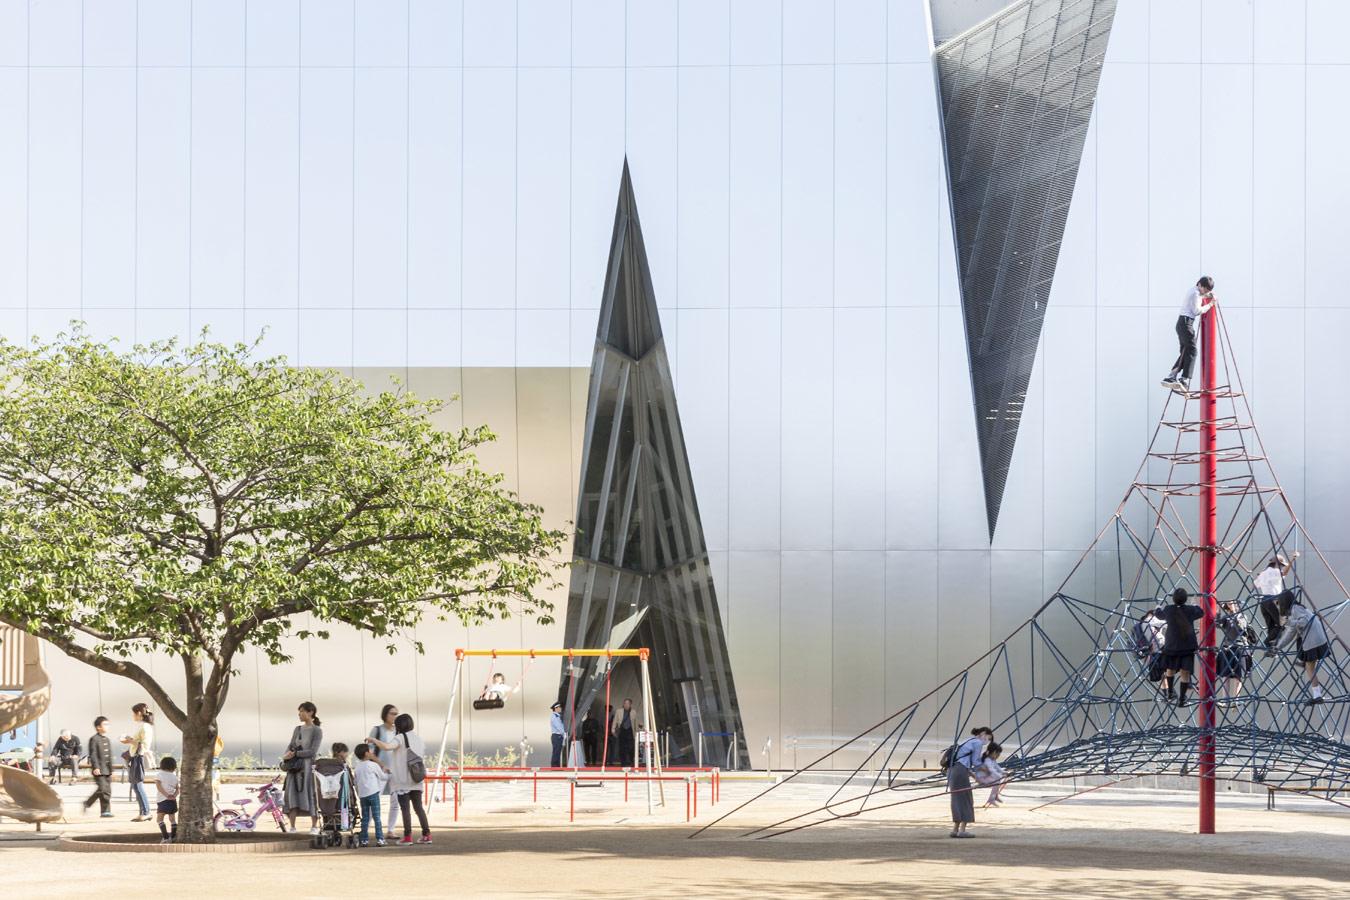 © Лауриан Гинитою (Laurian Ghinitoiu), Музея Сумида Хокусая в Токио (Япония). Архитектор: Kazuyo Sejima, Конкурс «Архитектурная фотография»